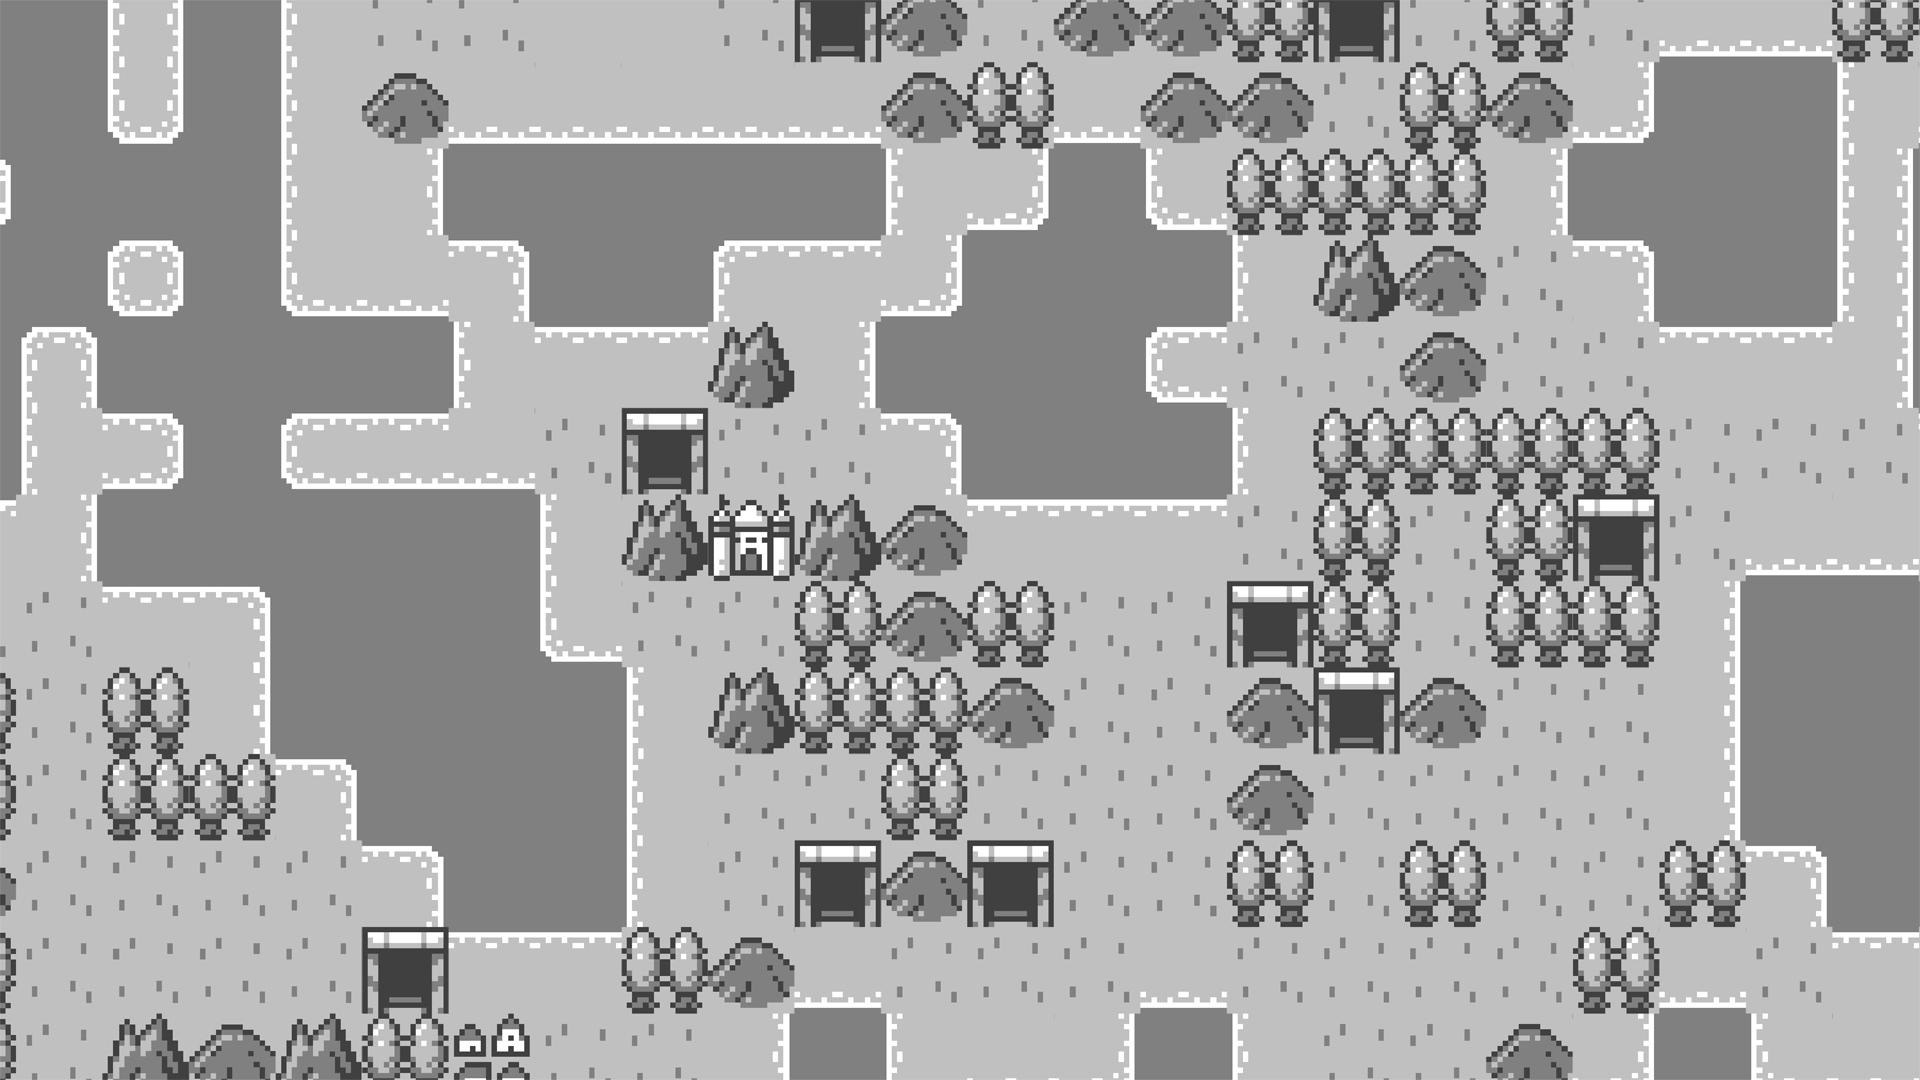 Unity 5: 2D Random Map Generation